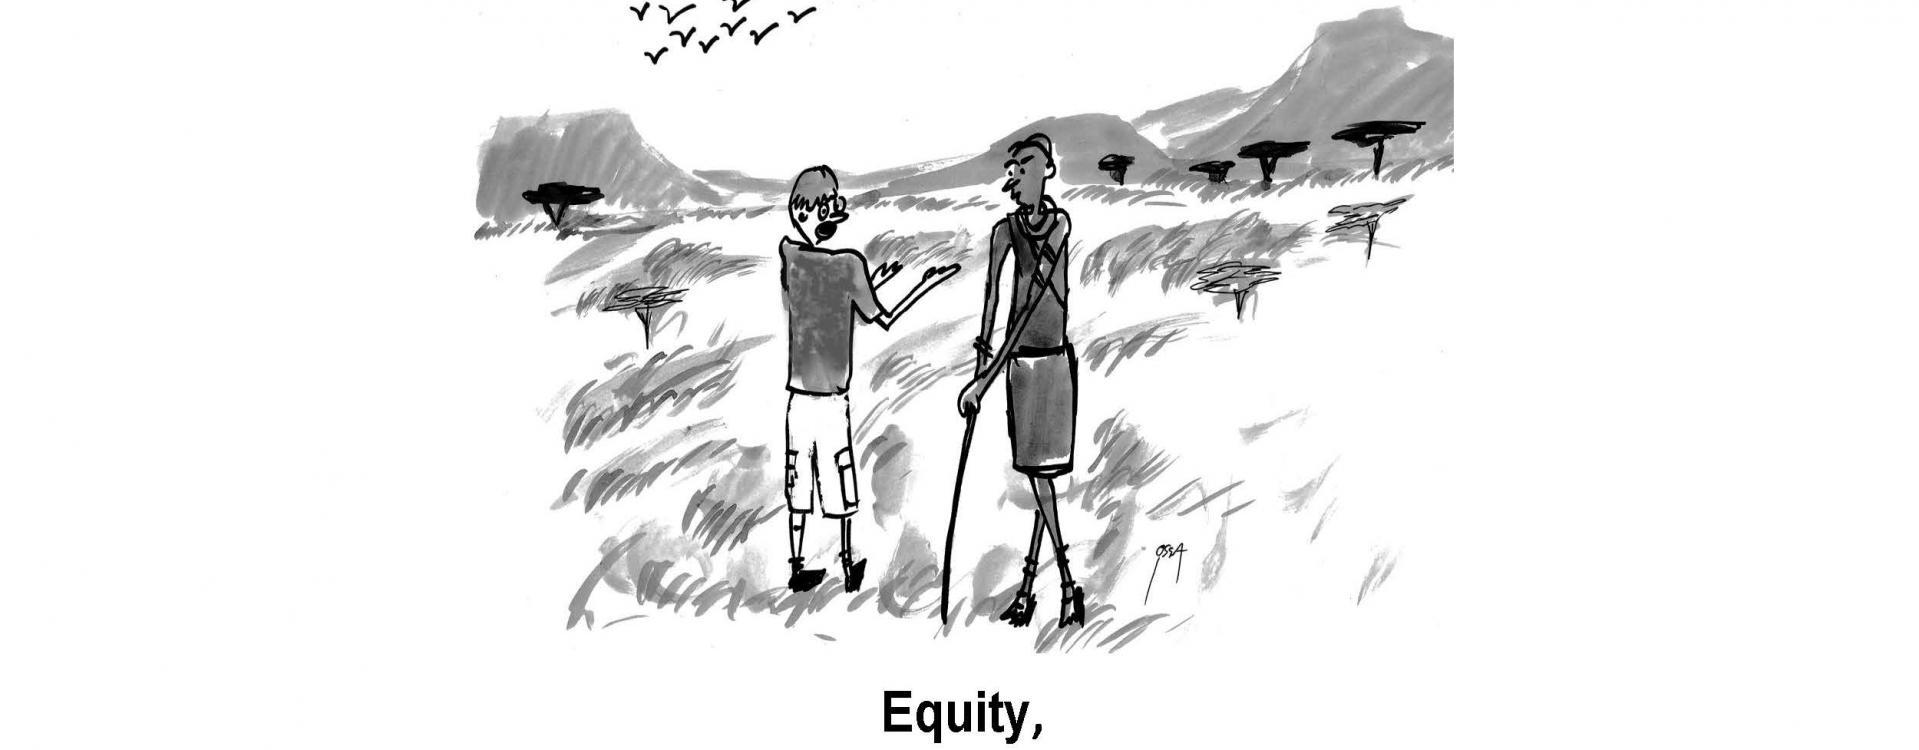 Equity,